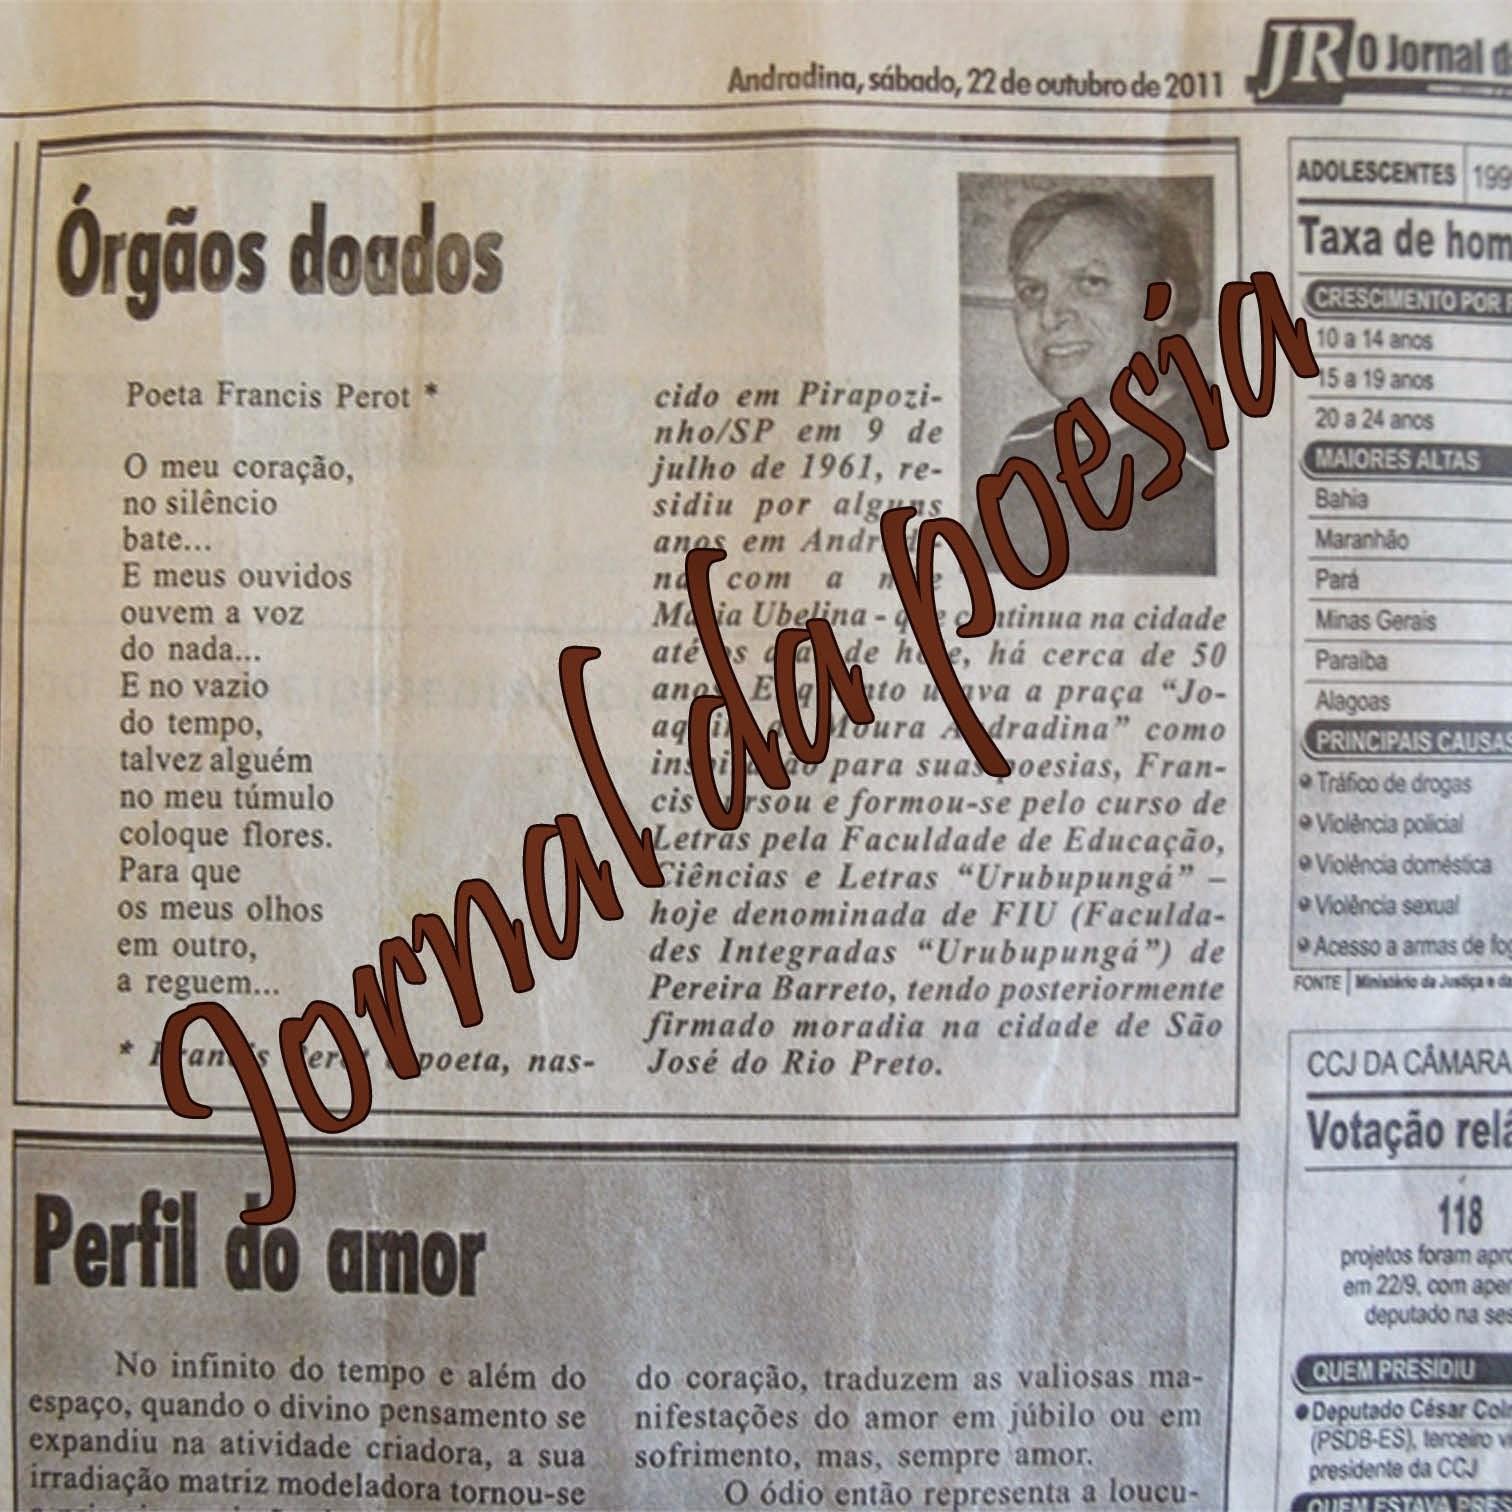 Jornal da poesia